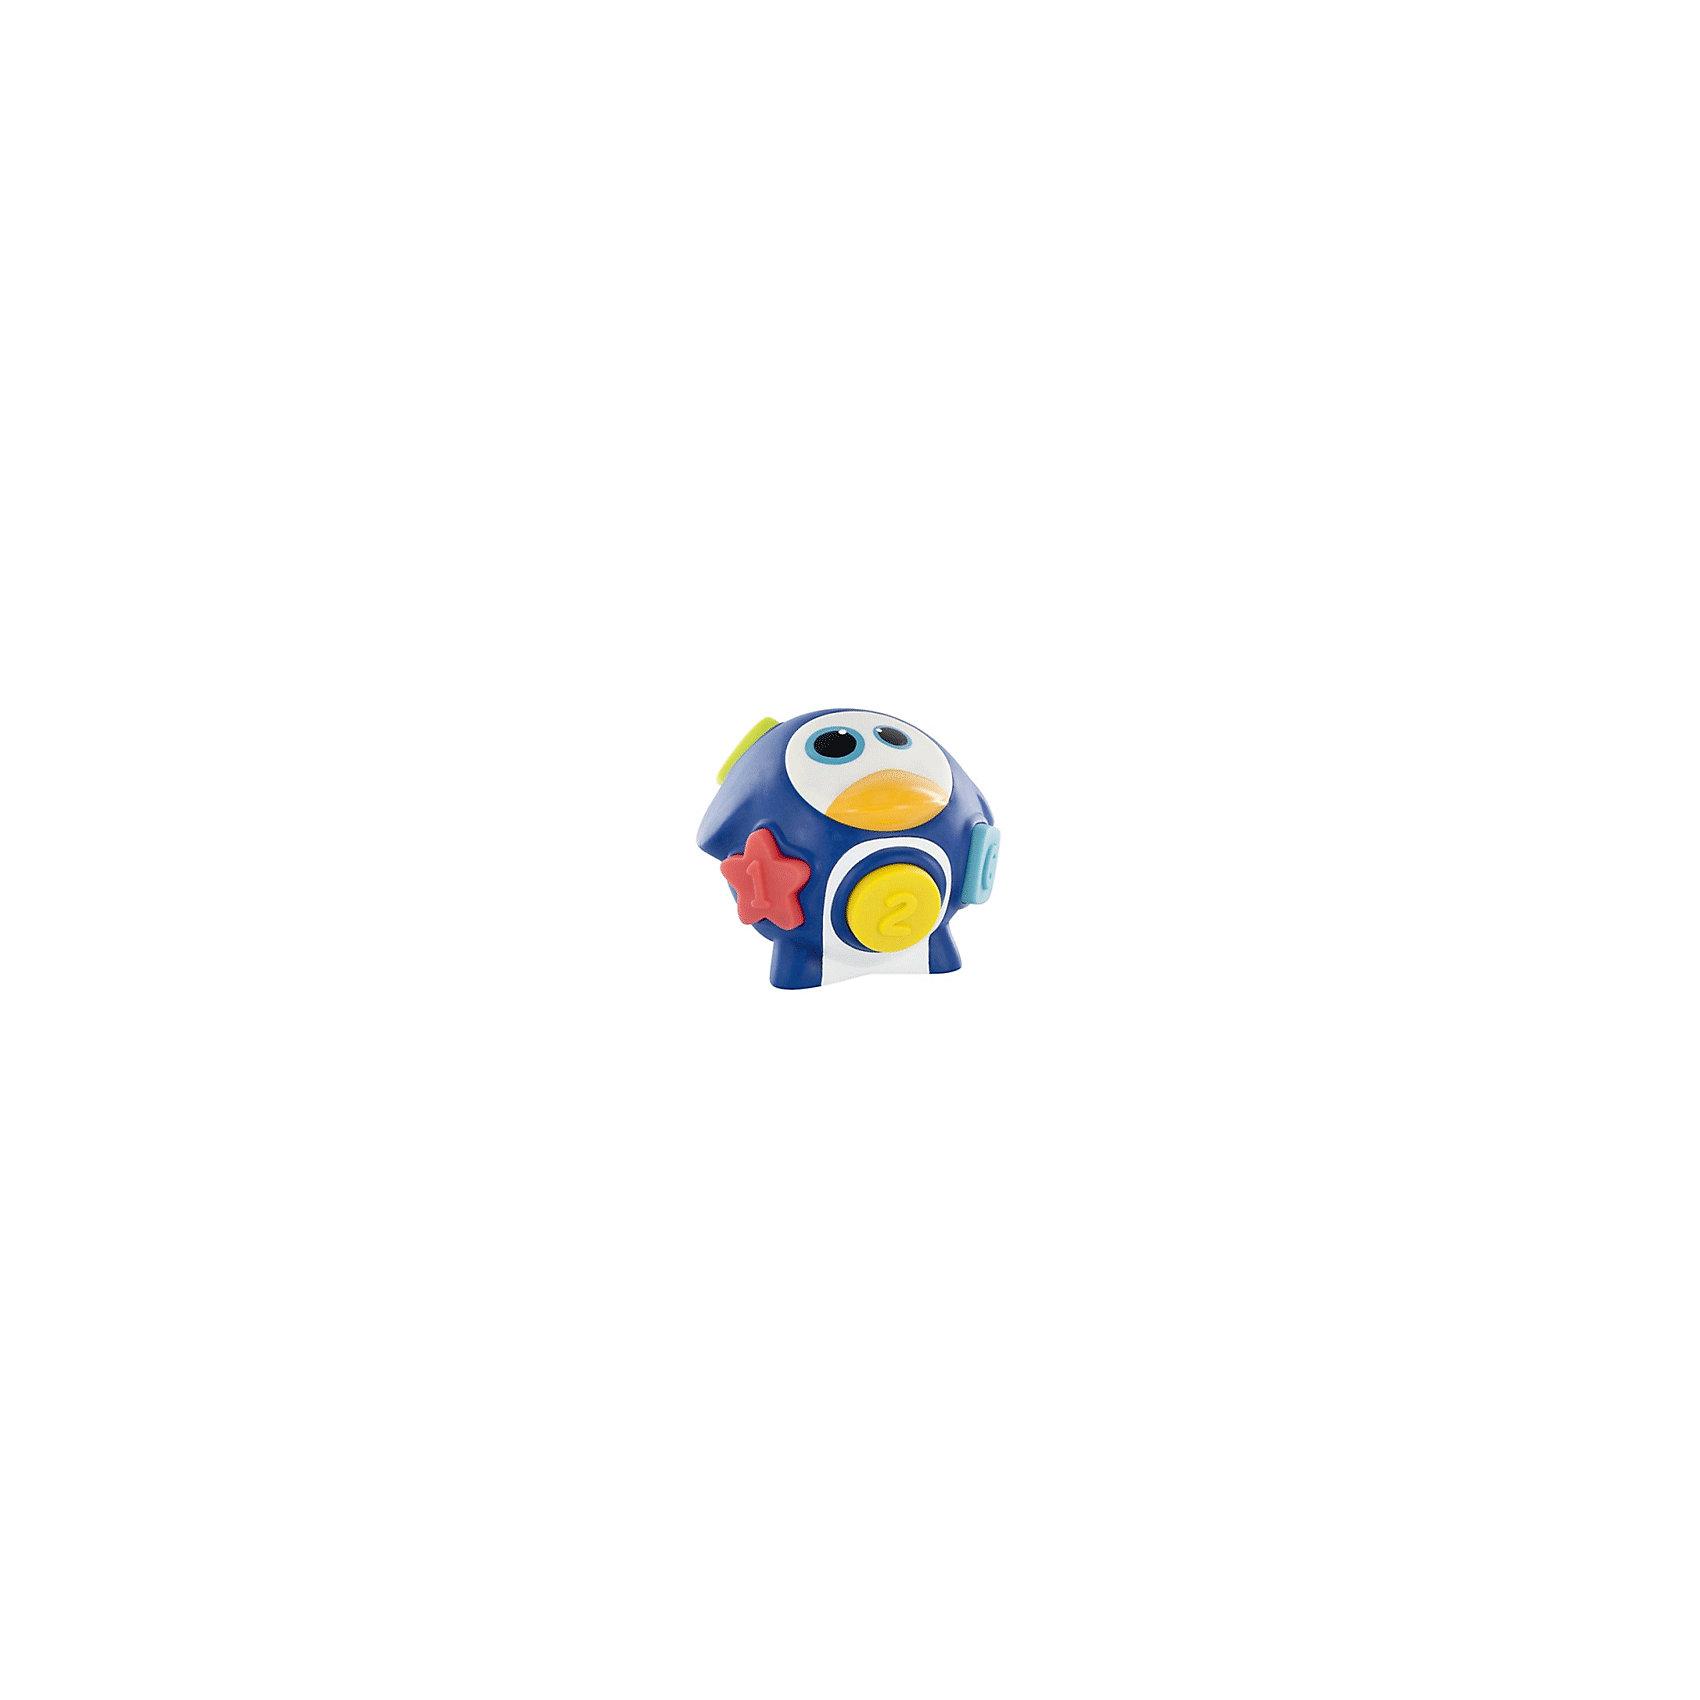 Babymoov Развивающая игрушка-сортер «Пингвин»  А104912, Babymoov мягкая игрушка пингвин tux купить